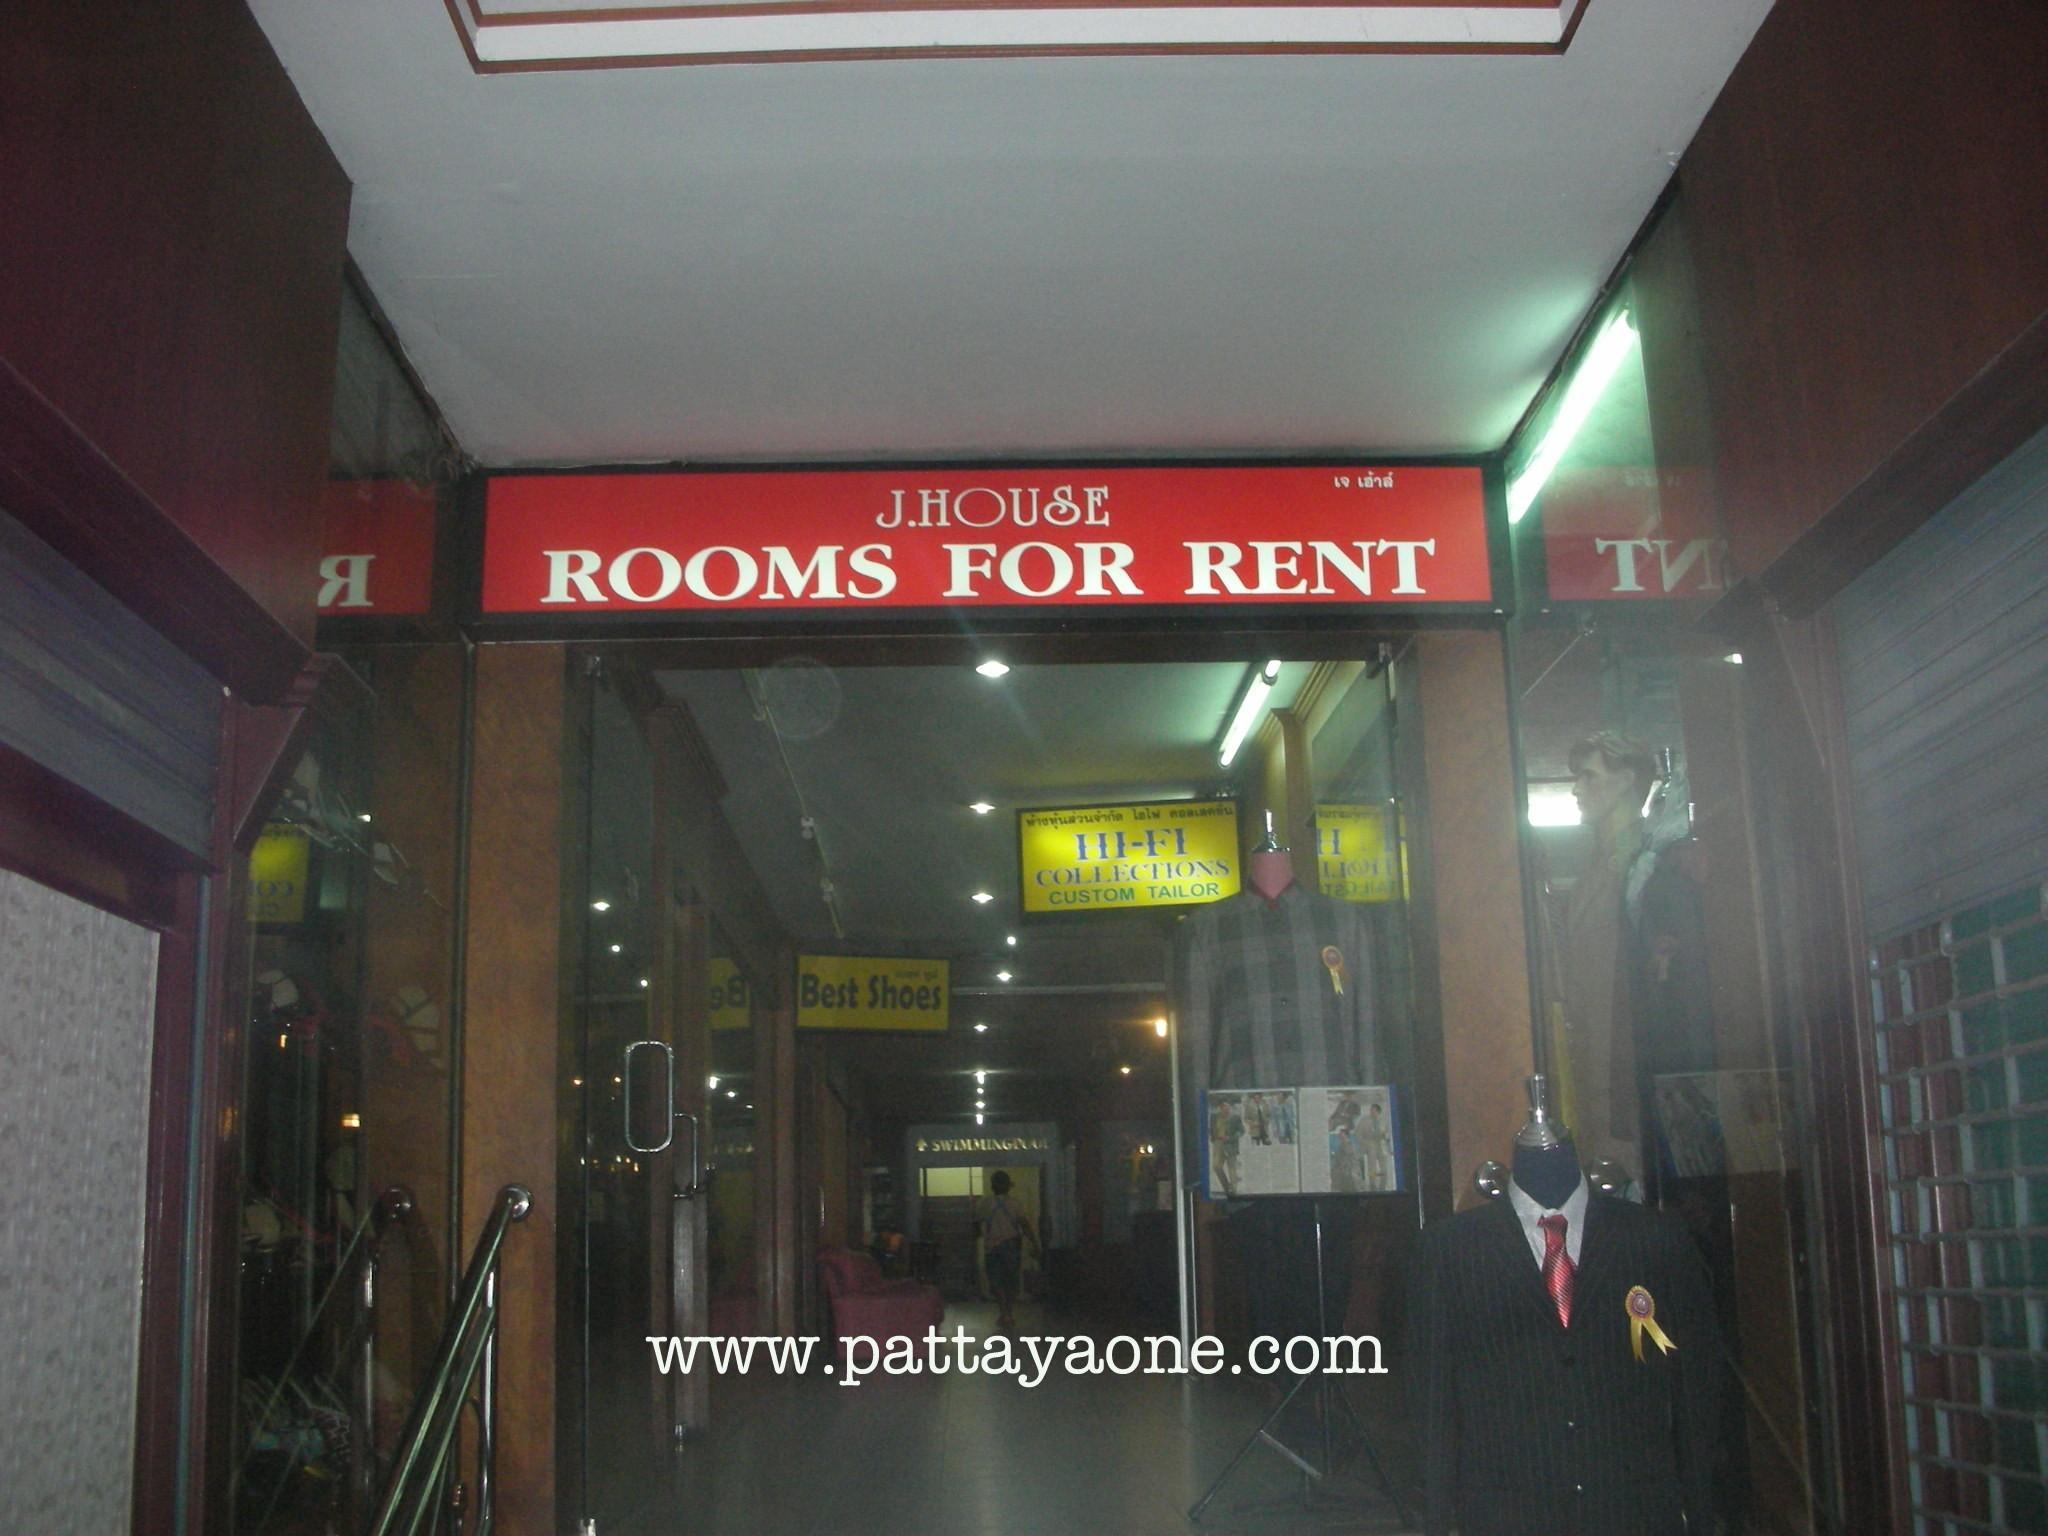 J House www.pattayaone.com